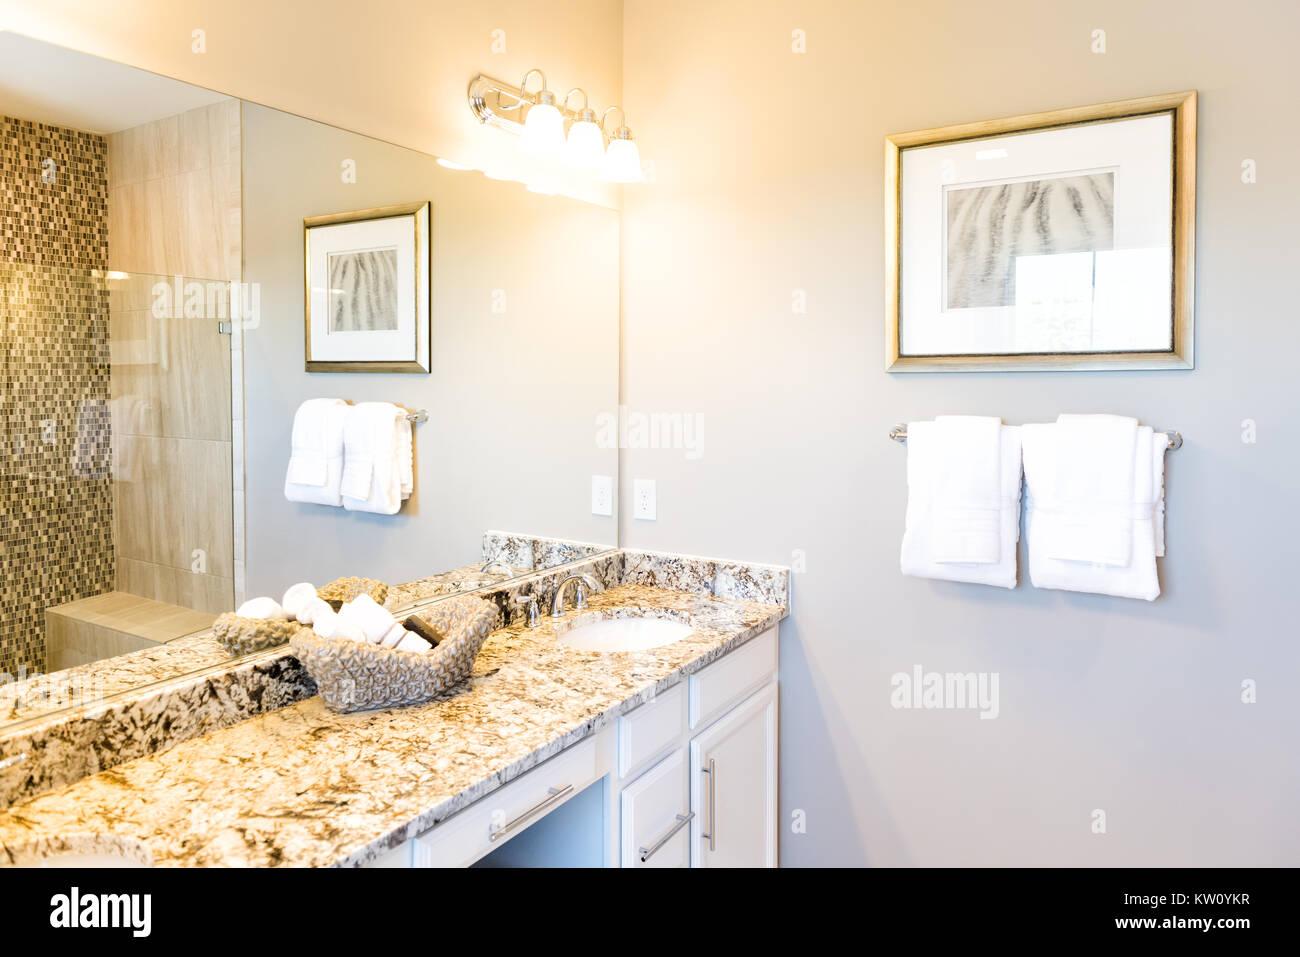 . Hand towels in woven basket in bathroom granite countertop with sink